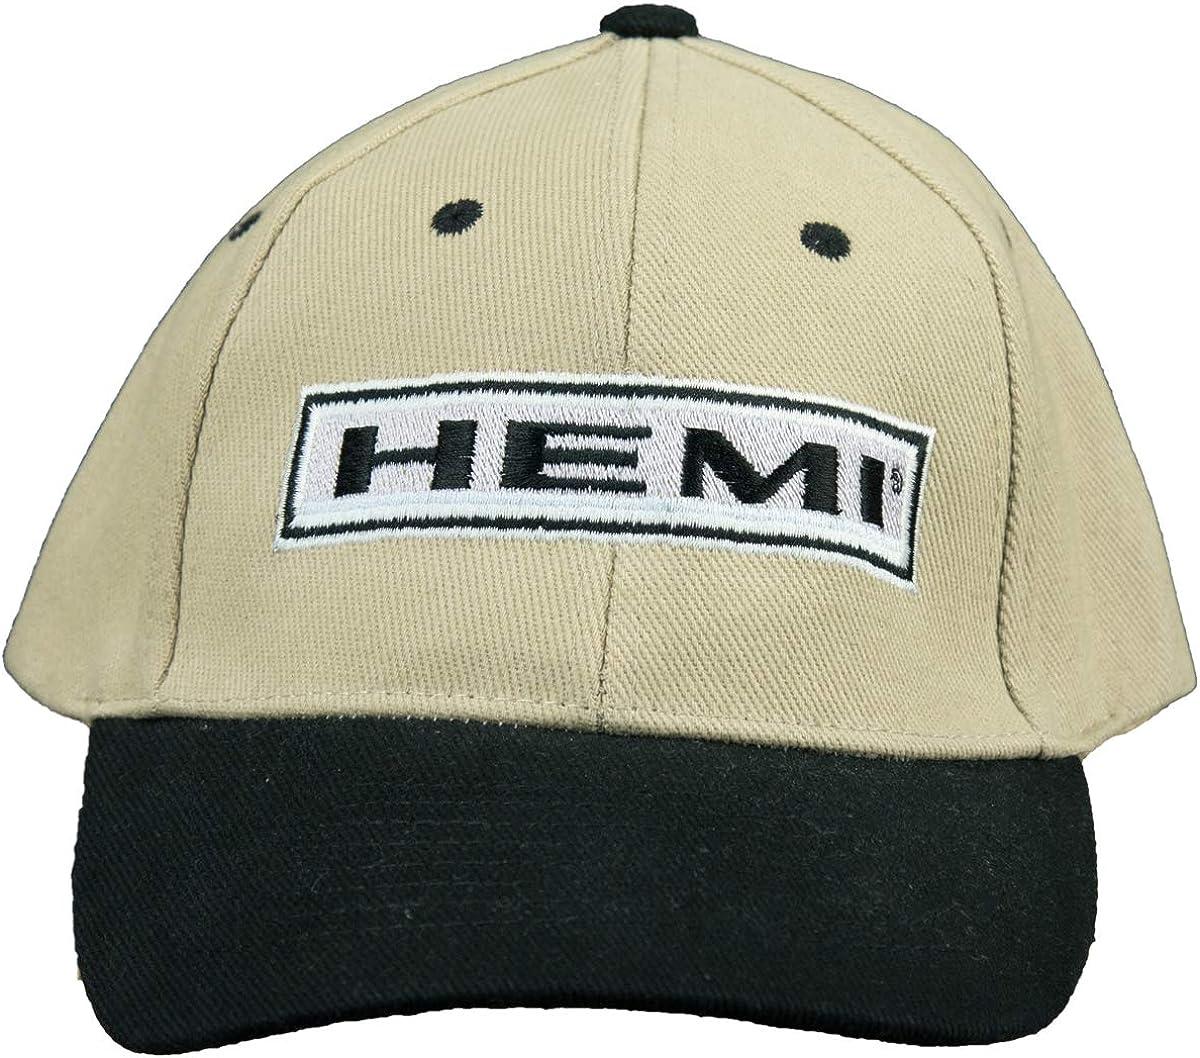 Dodge Hemi Hat Two Tone Embroidered Cap